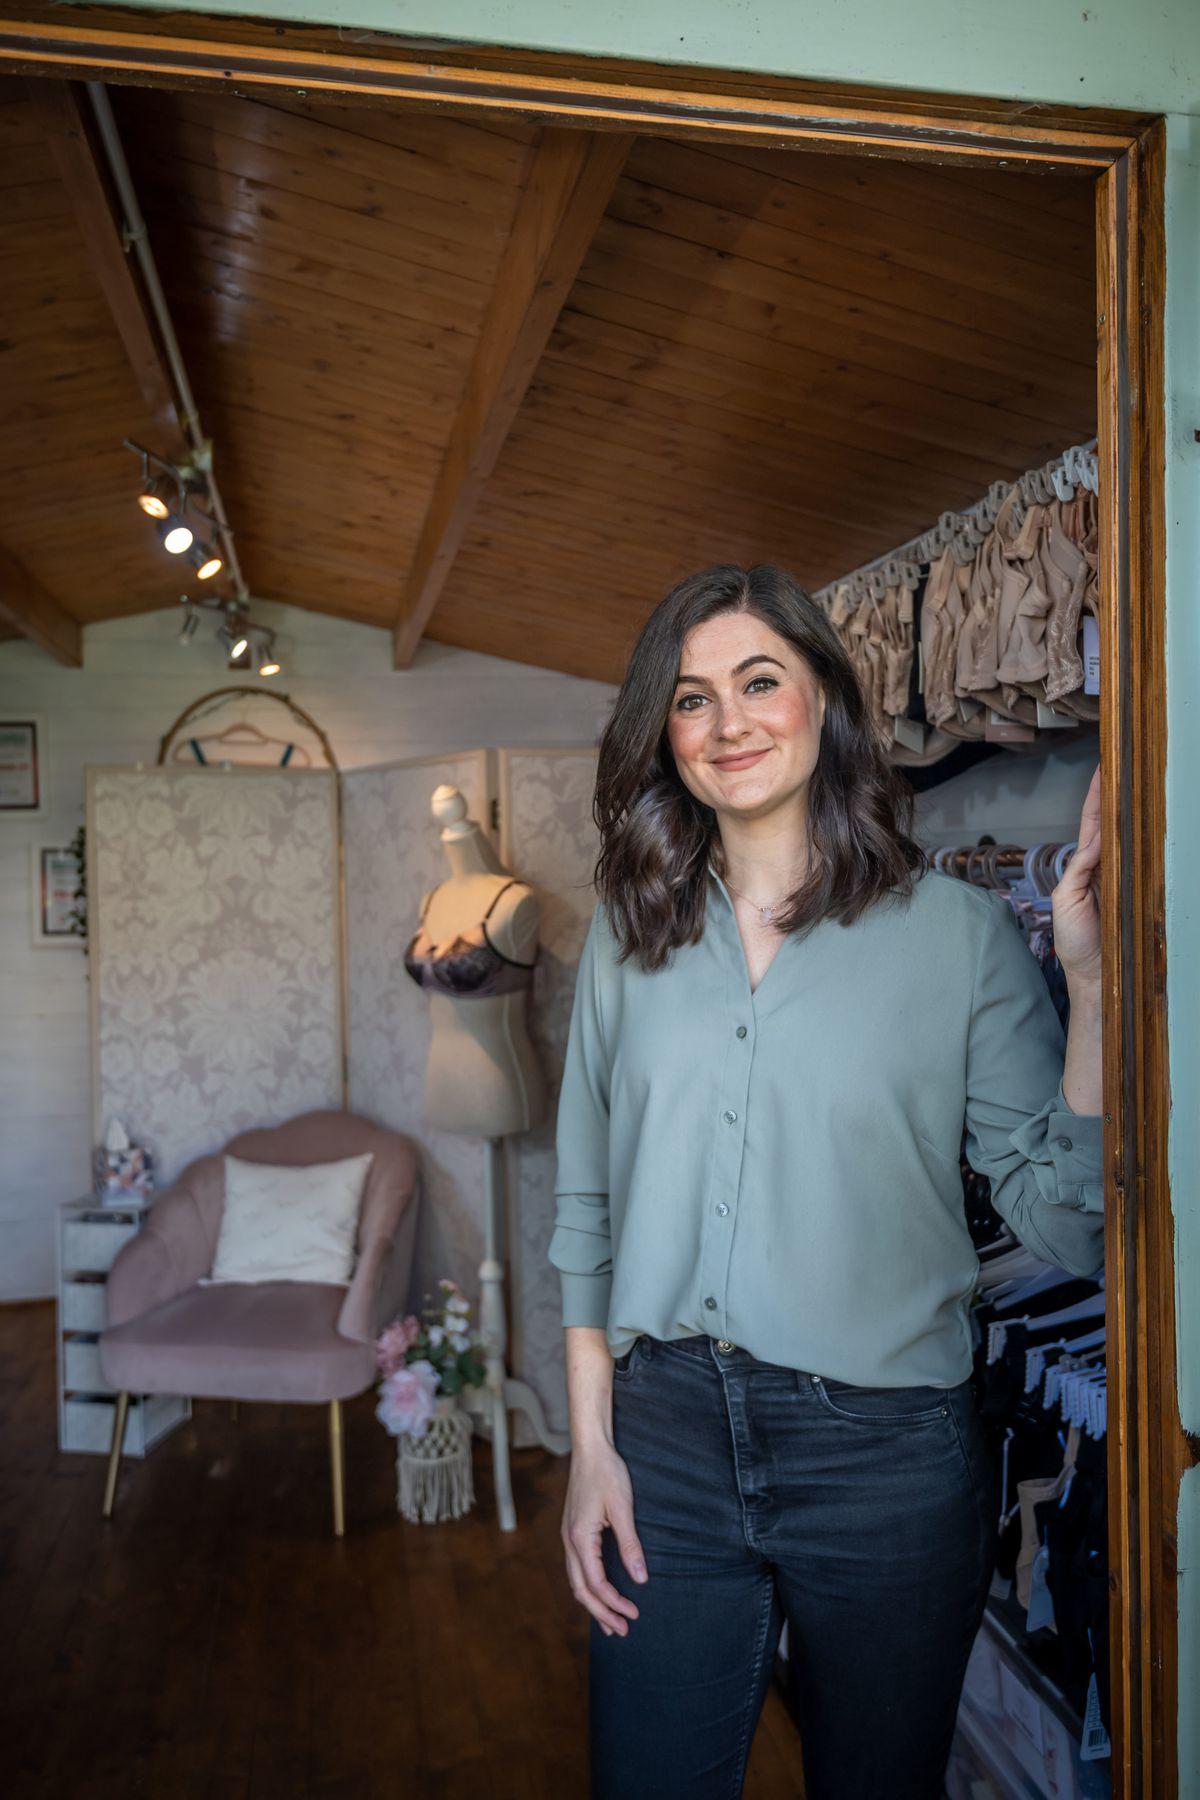 Joanna van Blommestein in her shed The Bra Boss of Kent HQ, in Faversham, Kent